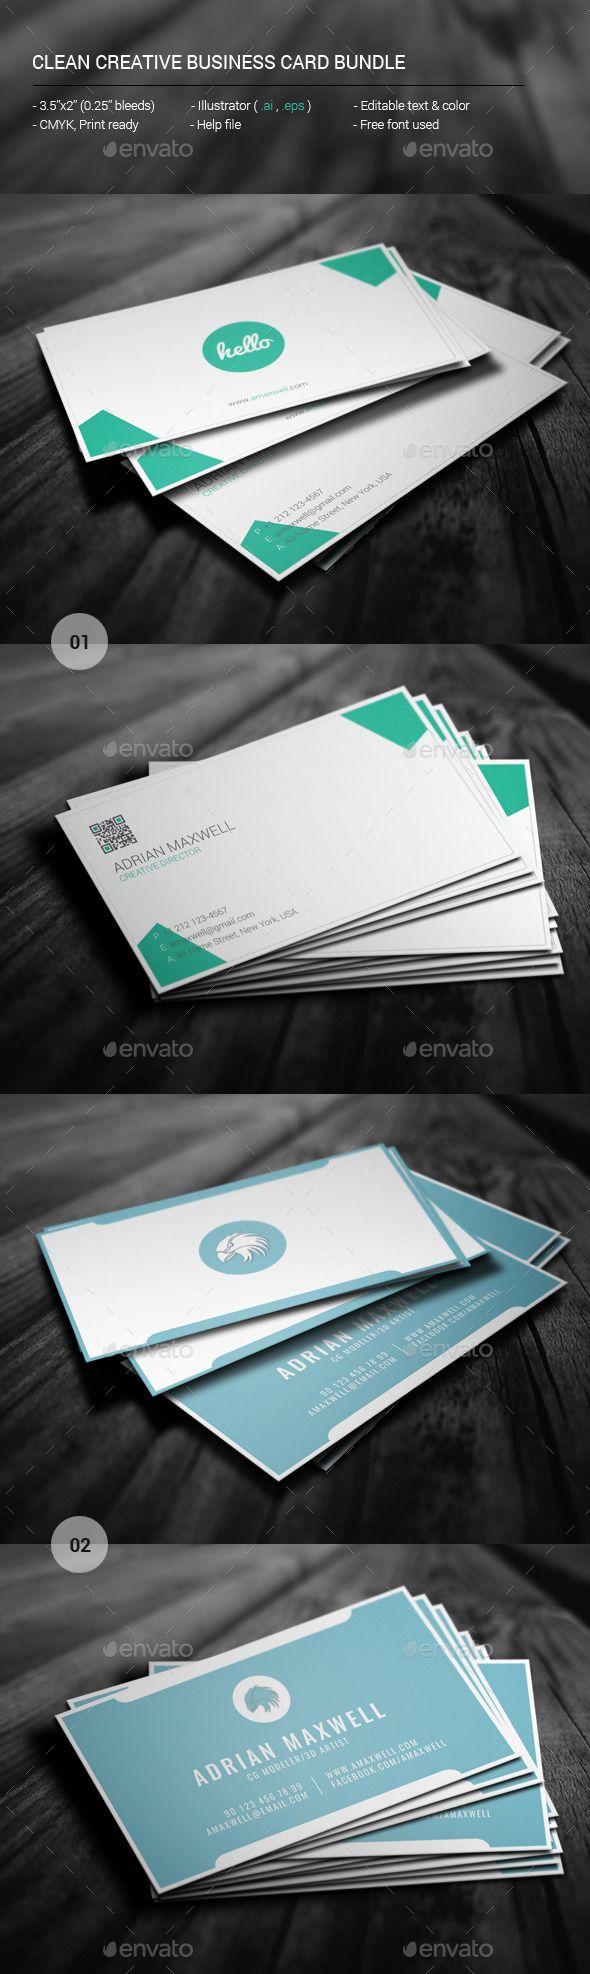 80 Best Name Card Design Images On Pinterest Business Cards